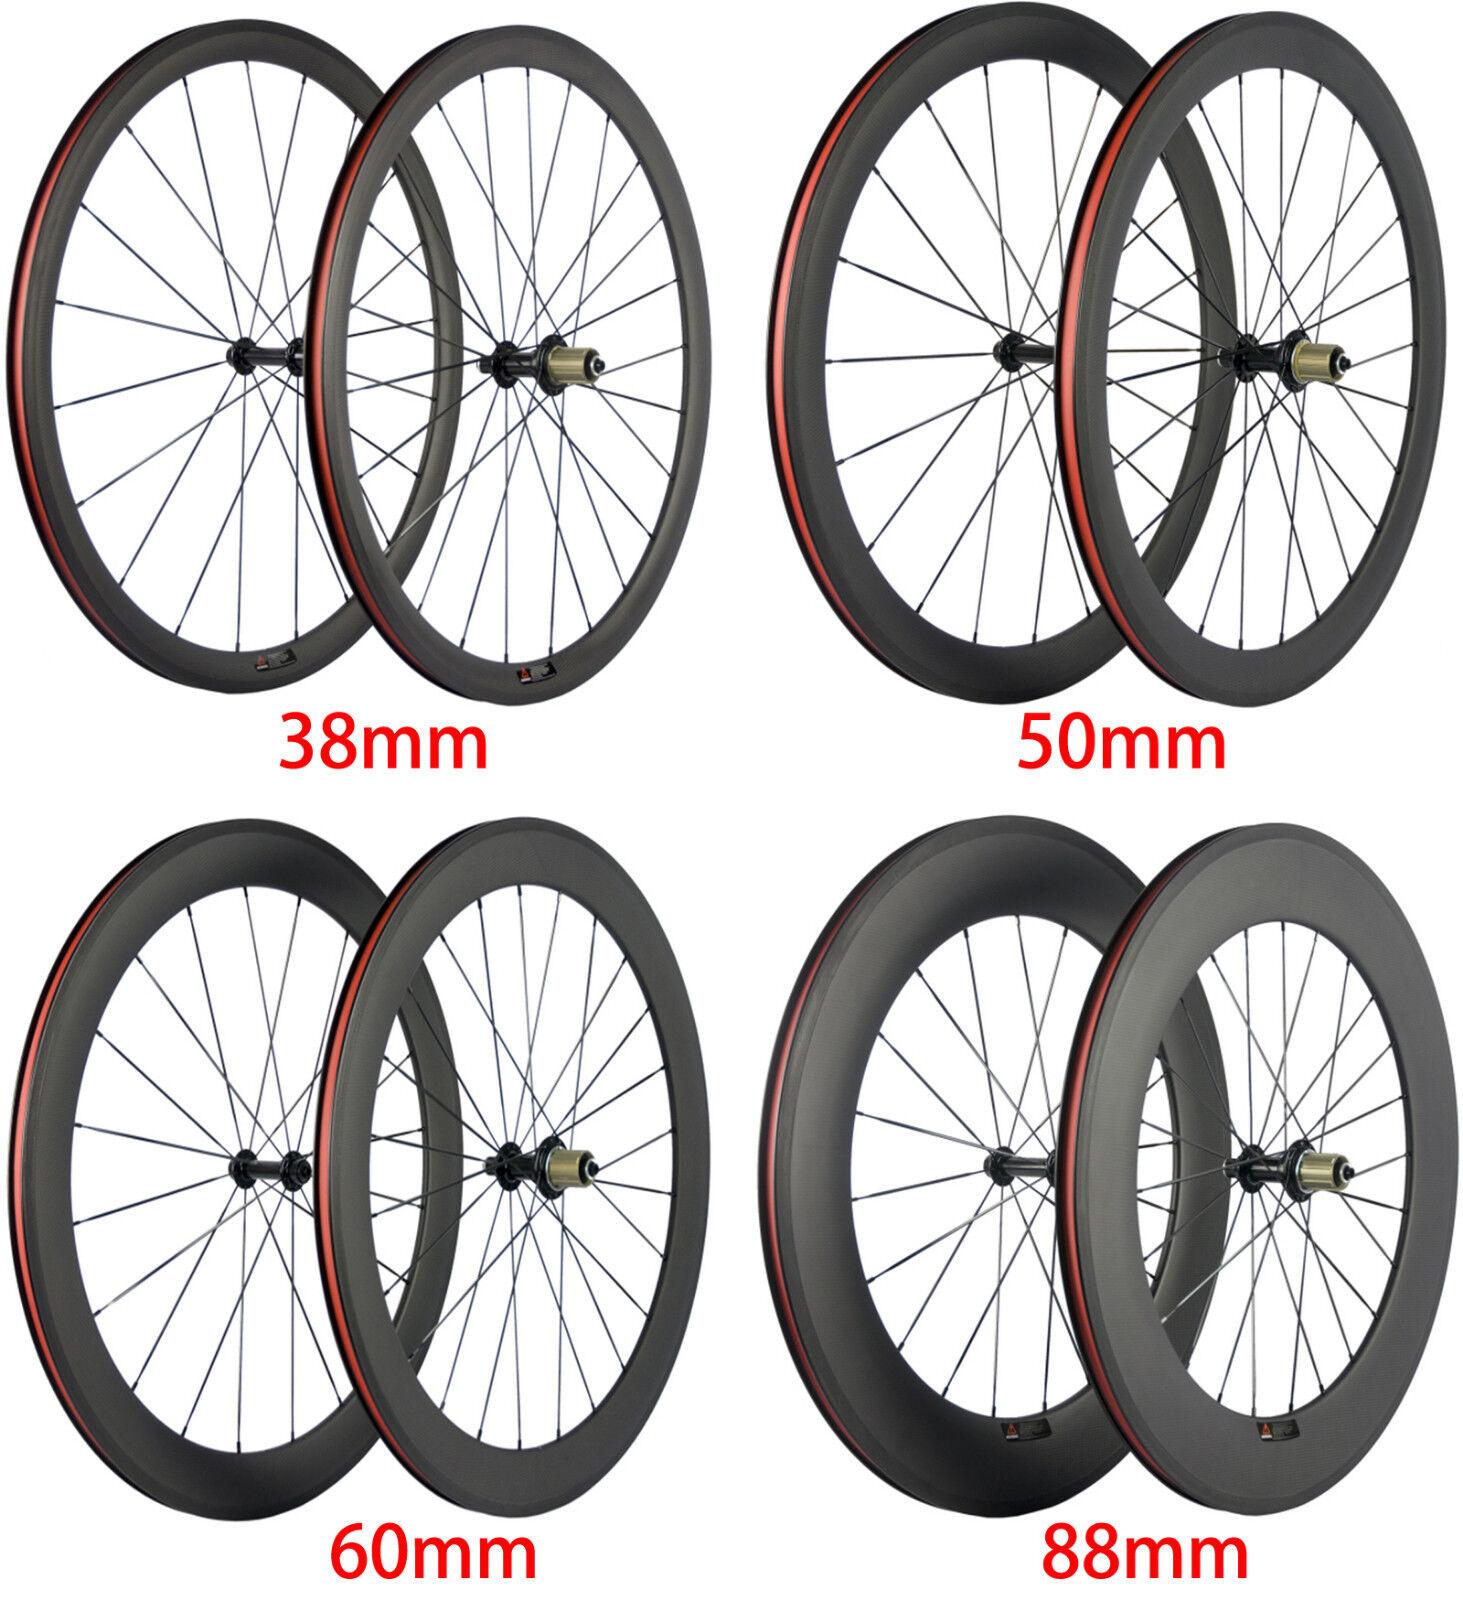 24 38 50 60 88mm Bicycle Bike Wheels Carbon Fiber Wheelset 700C Clincher Tubular